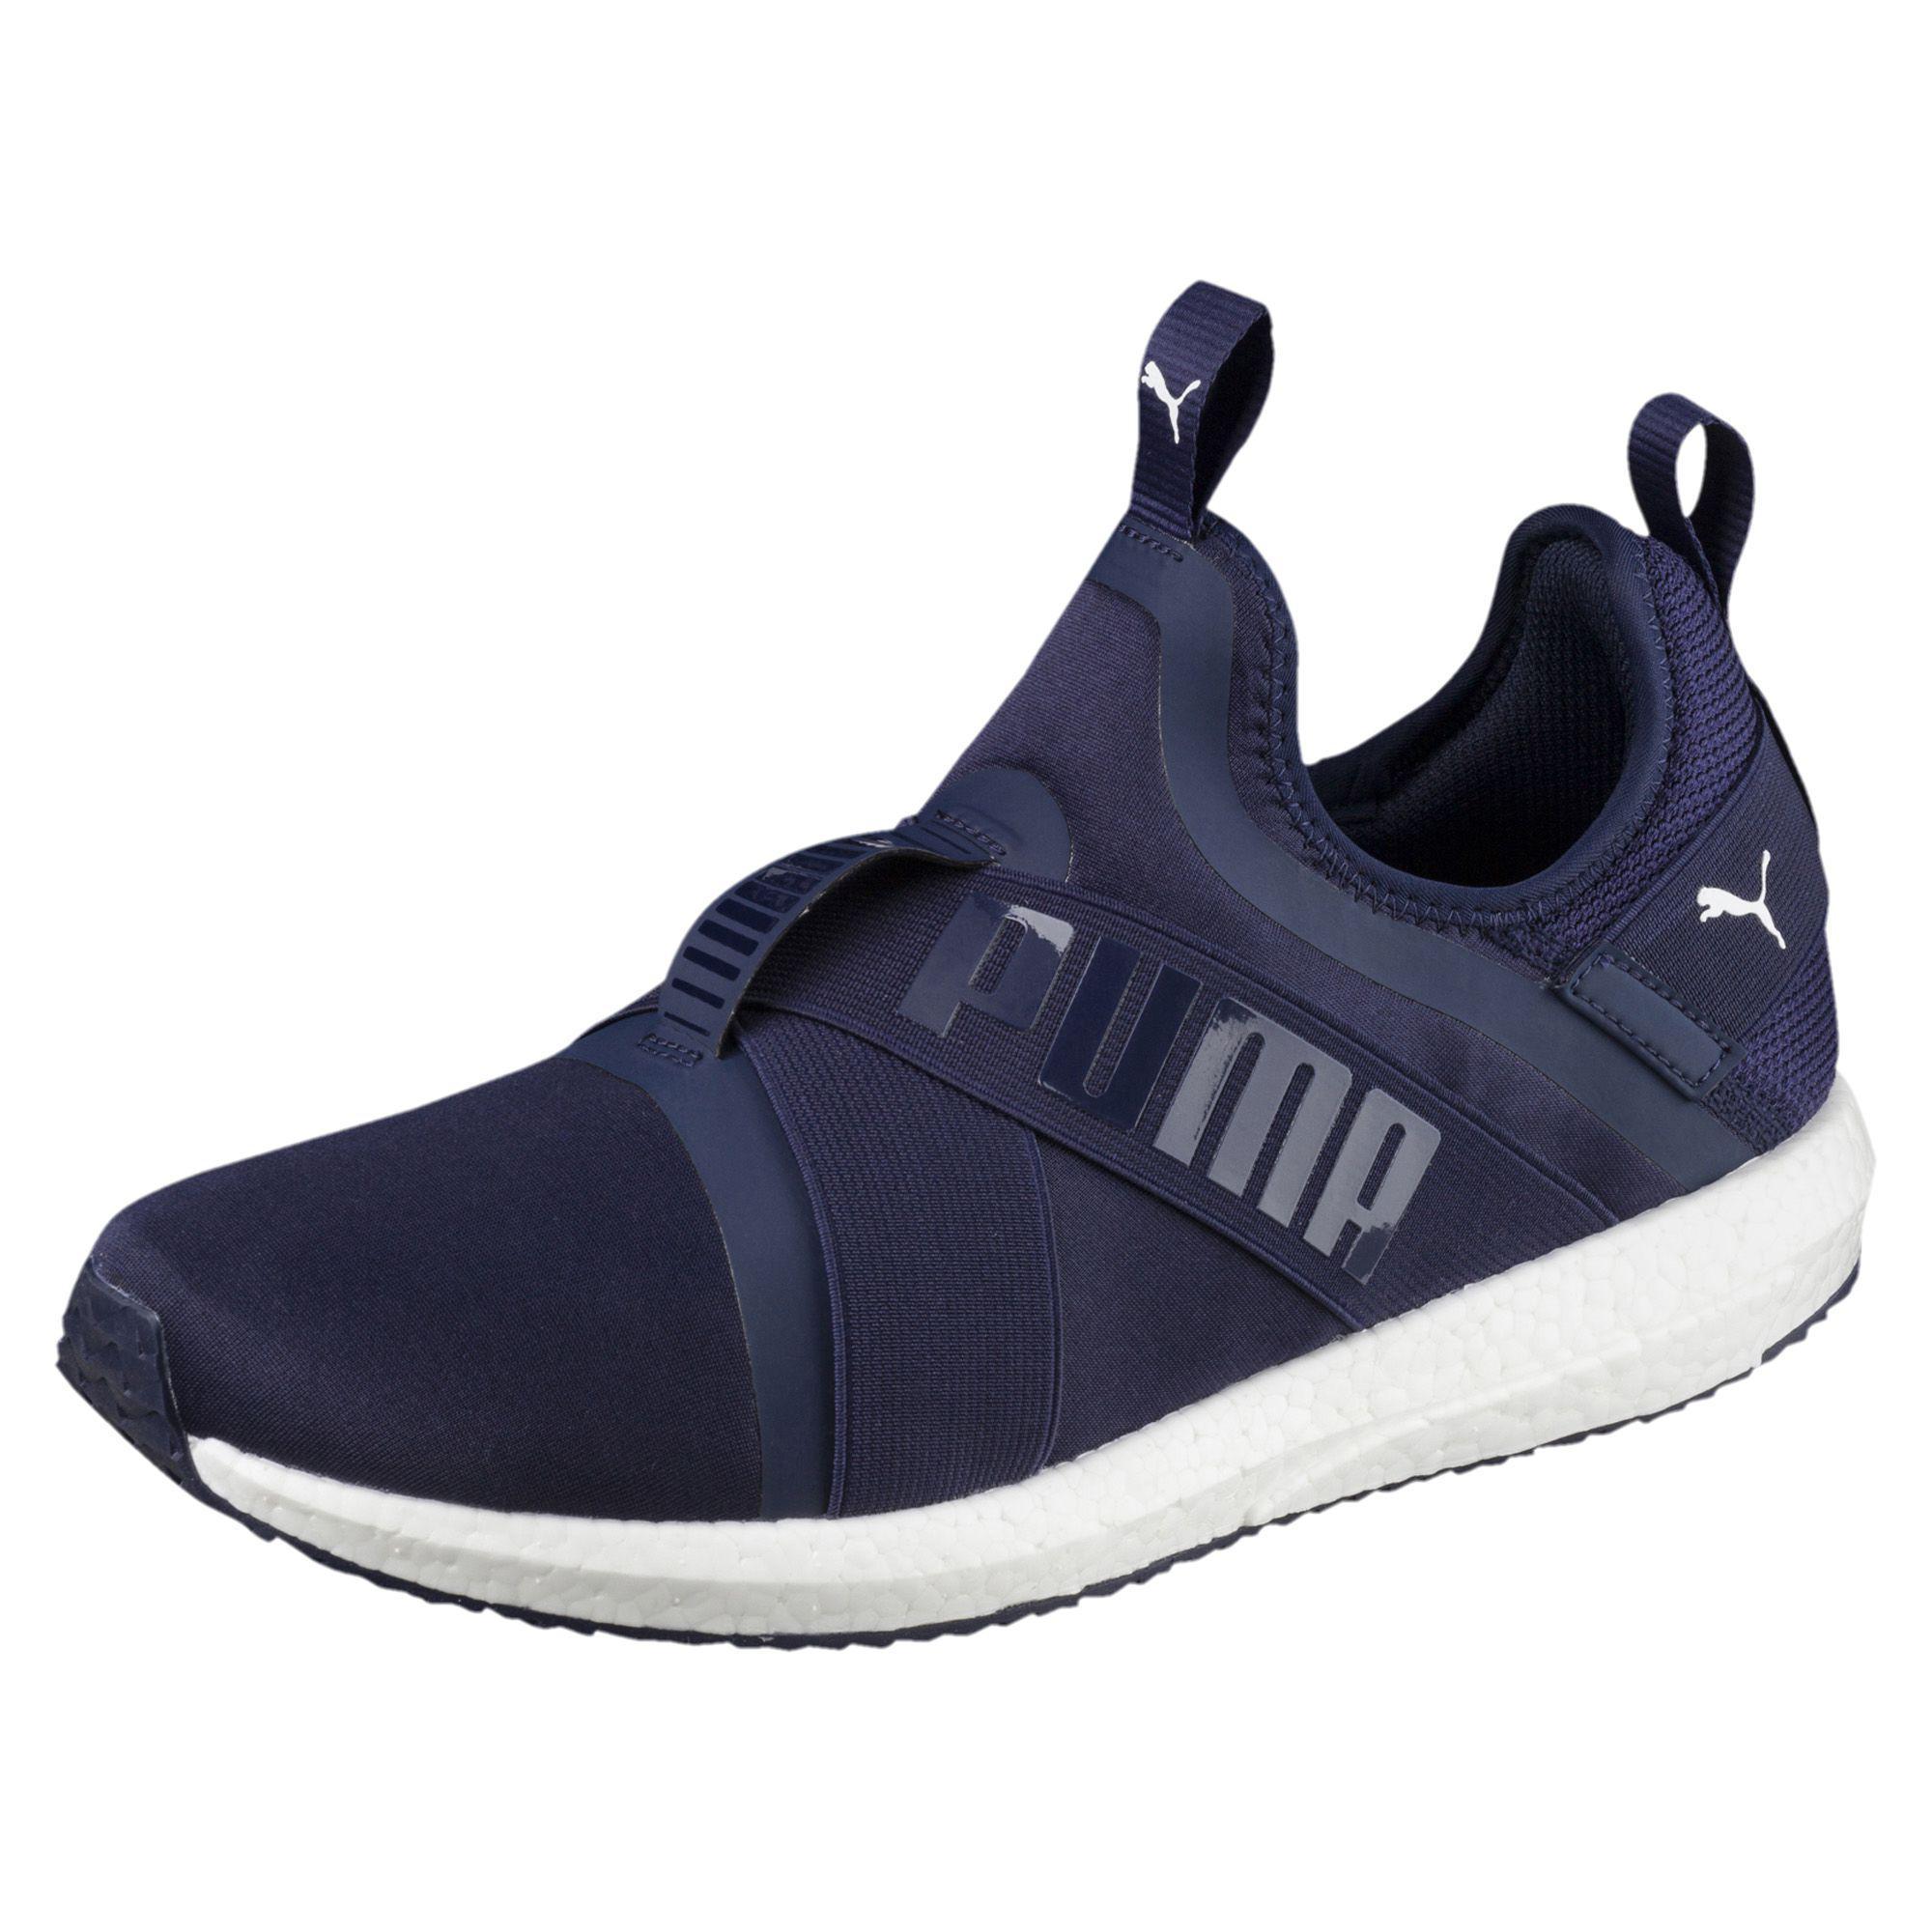 daa173b233b47e Lyst - PUMA Mega Nrgy X Men s Running Shoes in Blue for Men